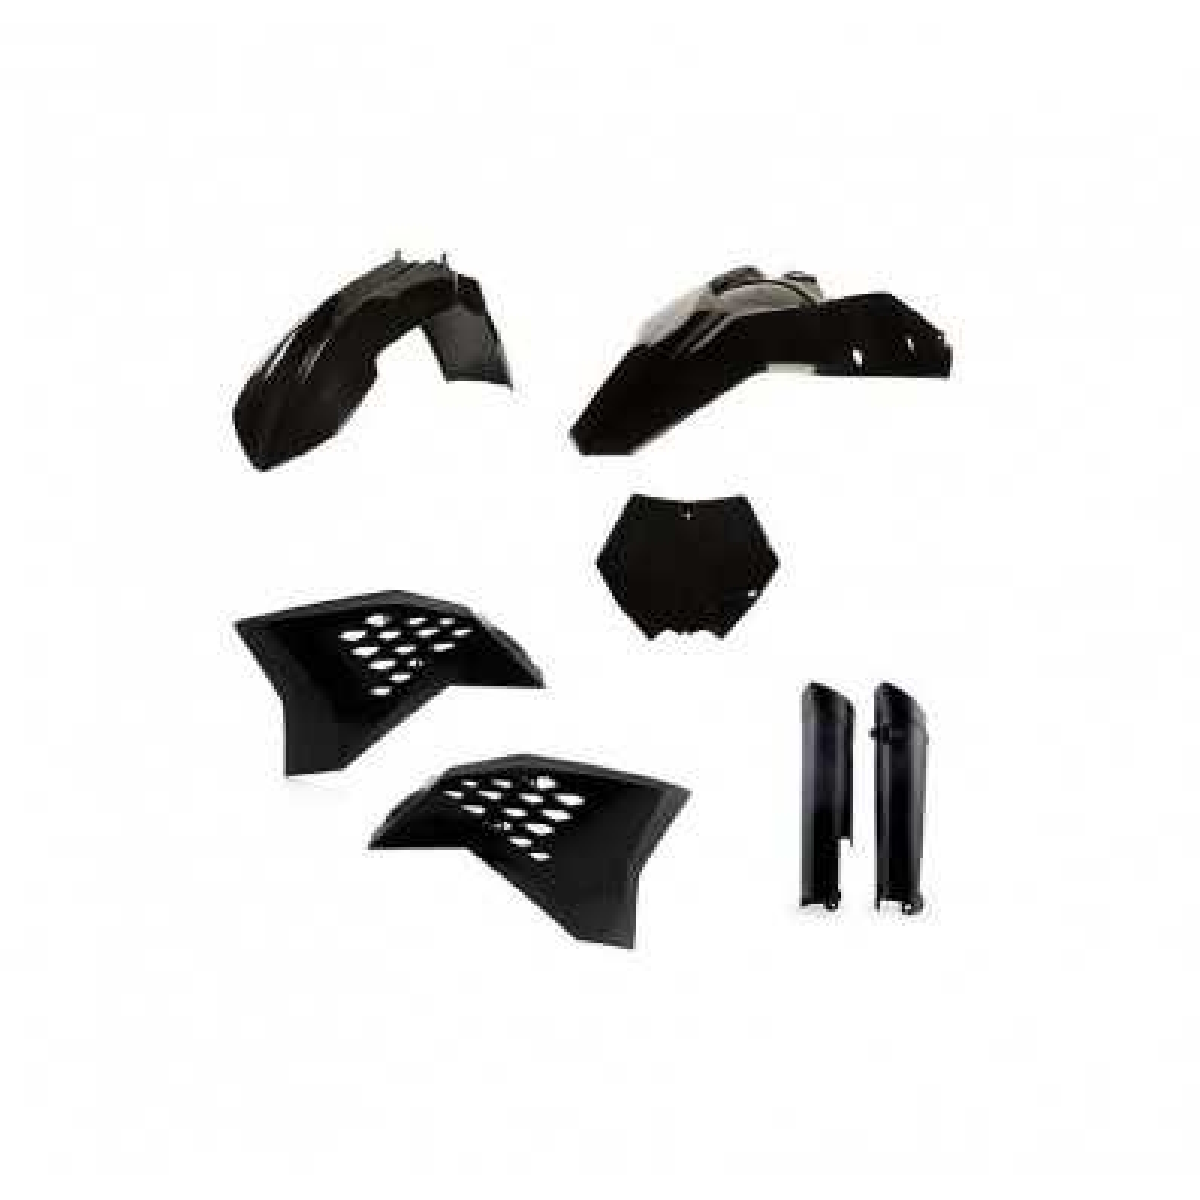 0010294-090 - Kit Plasticos Sx 125 07 10 Negro